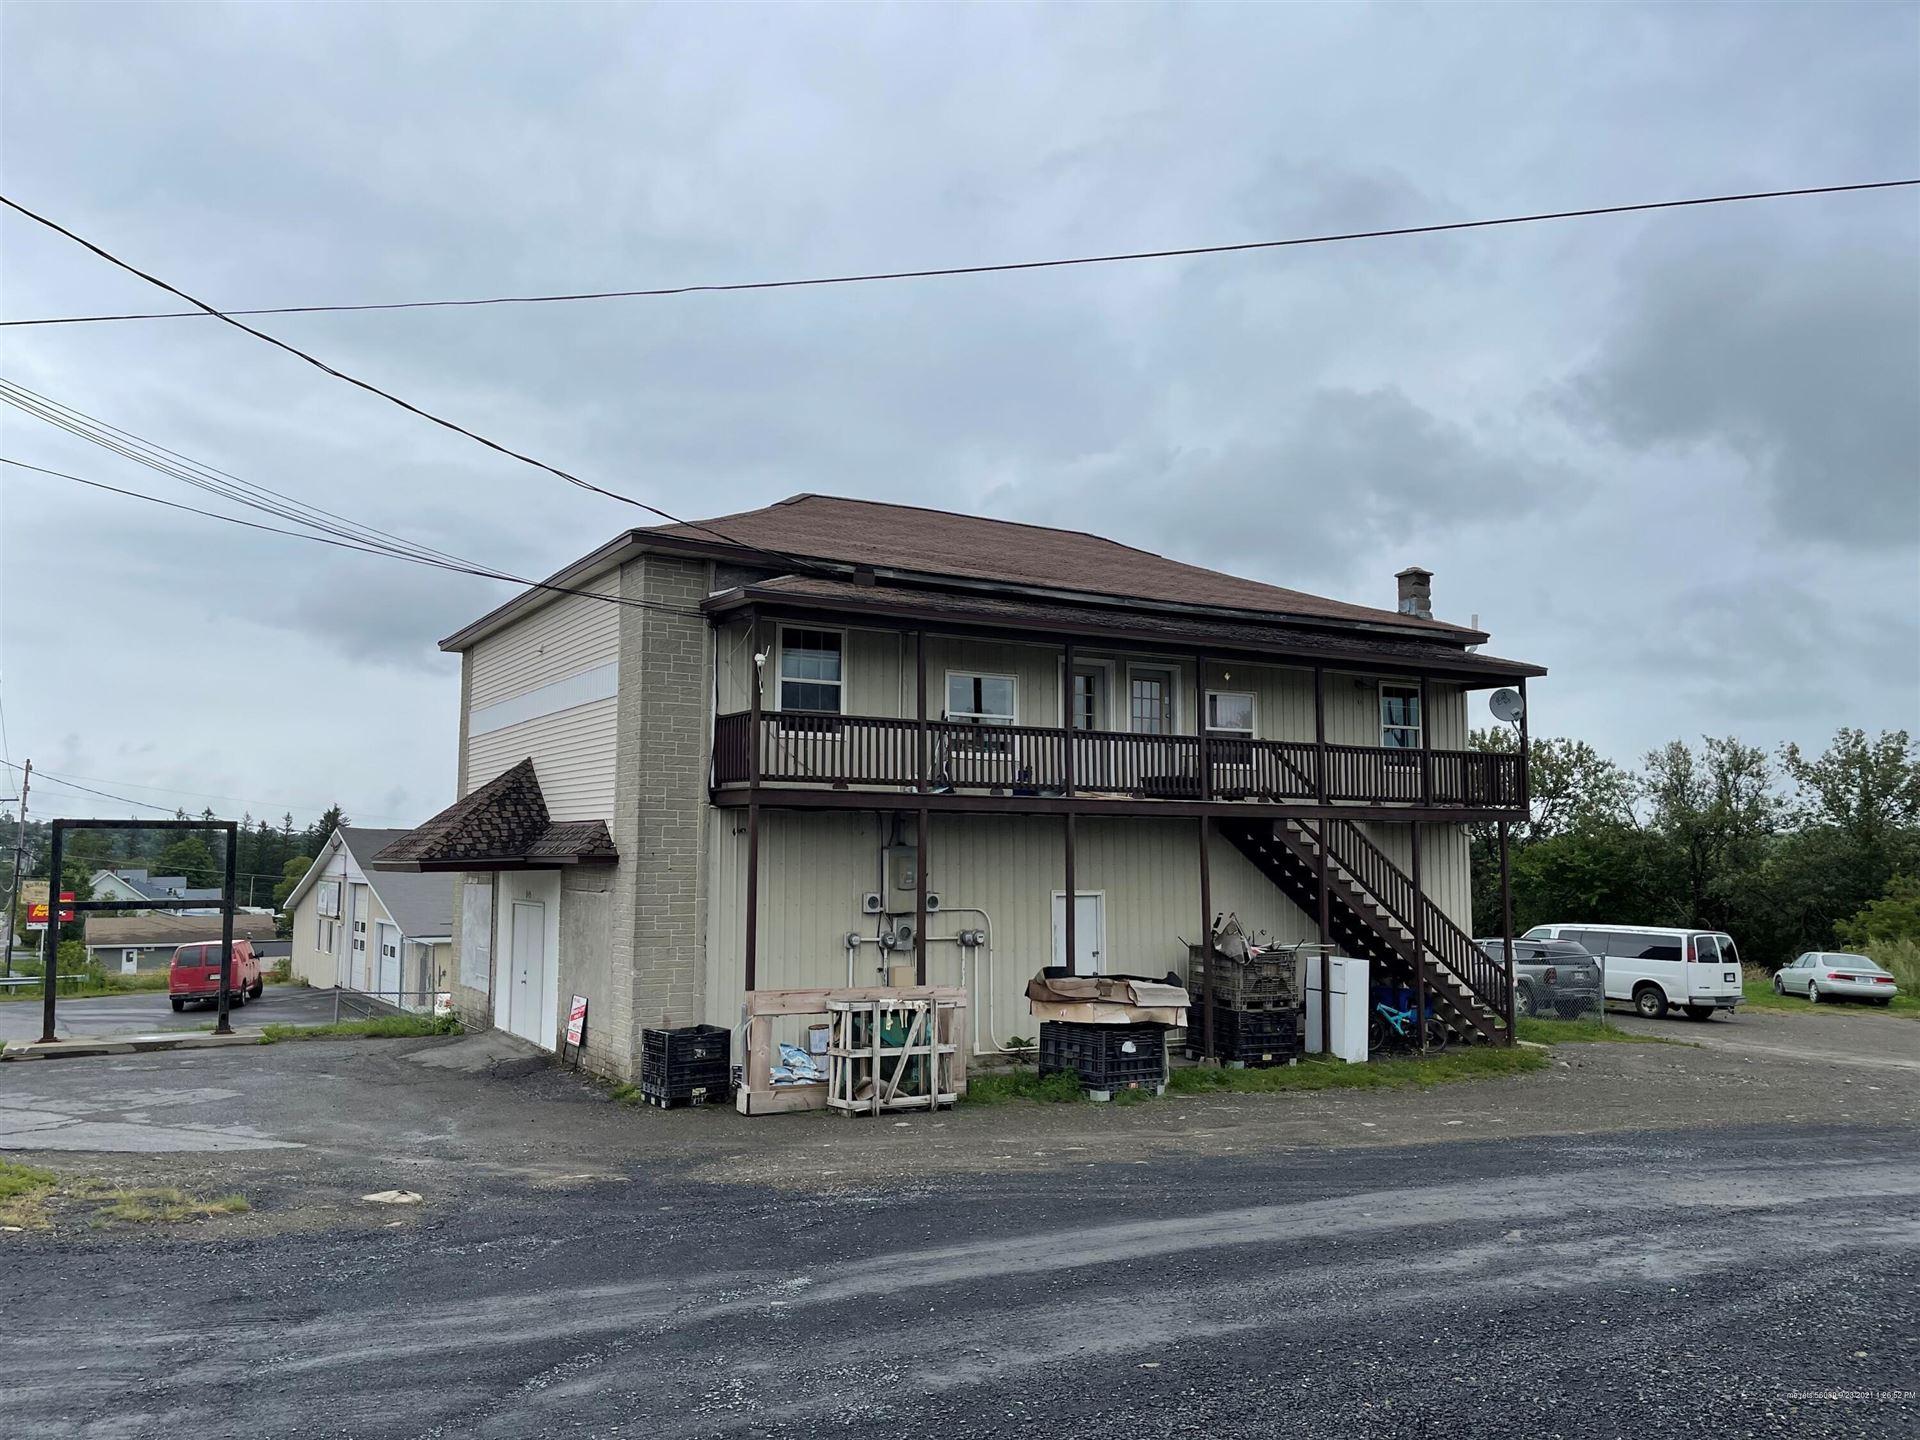 Photo of 545 Main Street, Caribou, ME 04736 (MLS # 1508745)